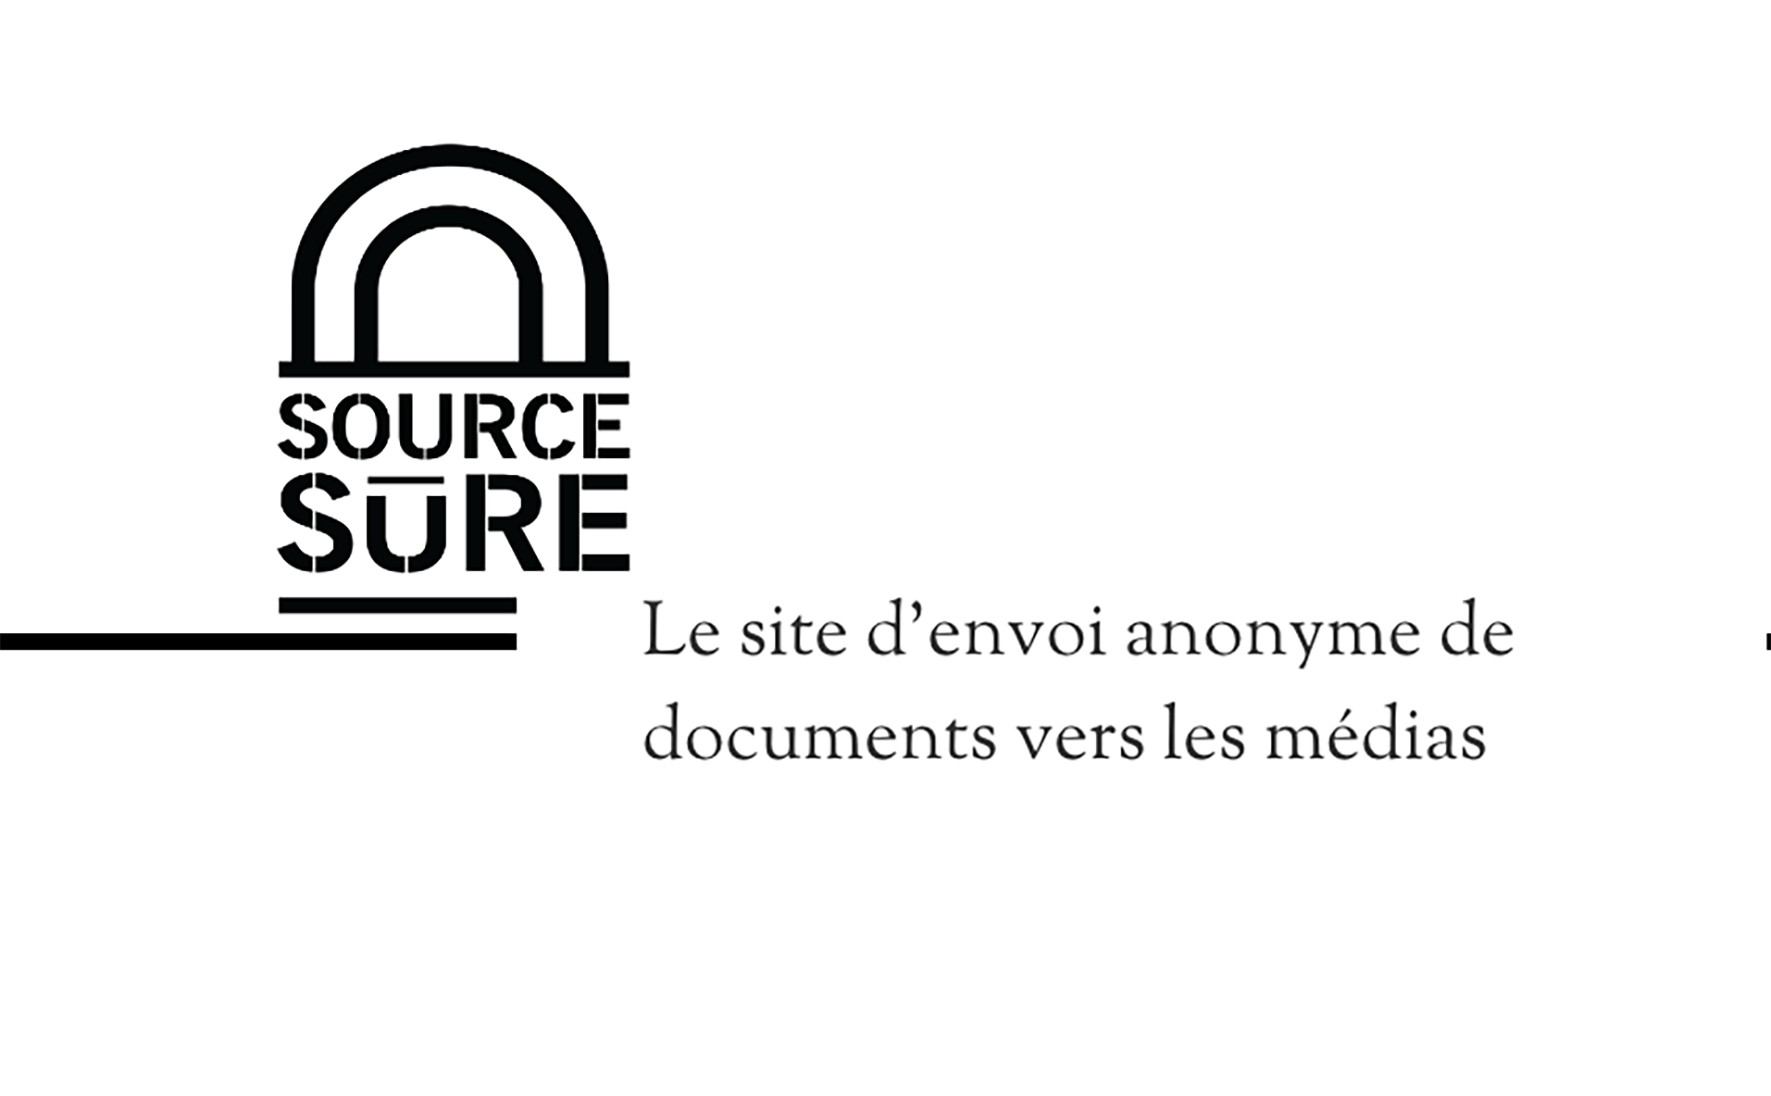 Source-sure